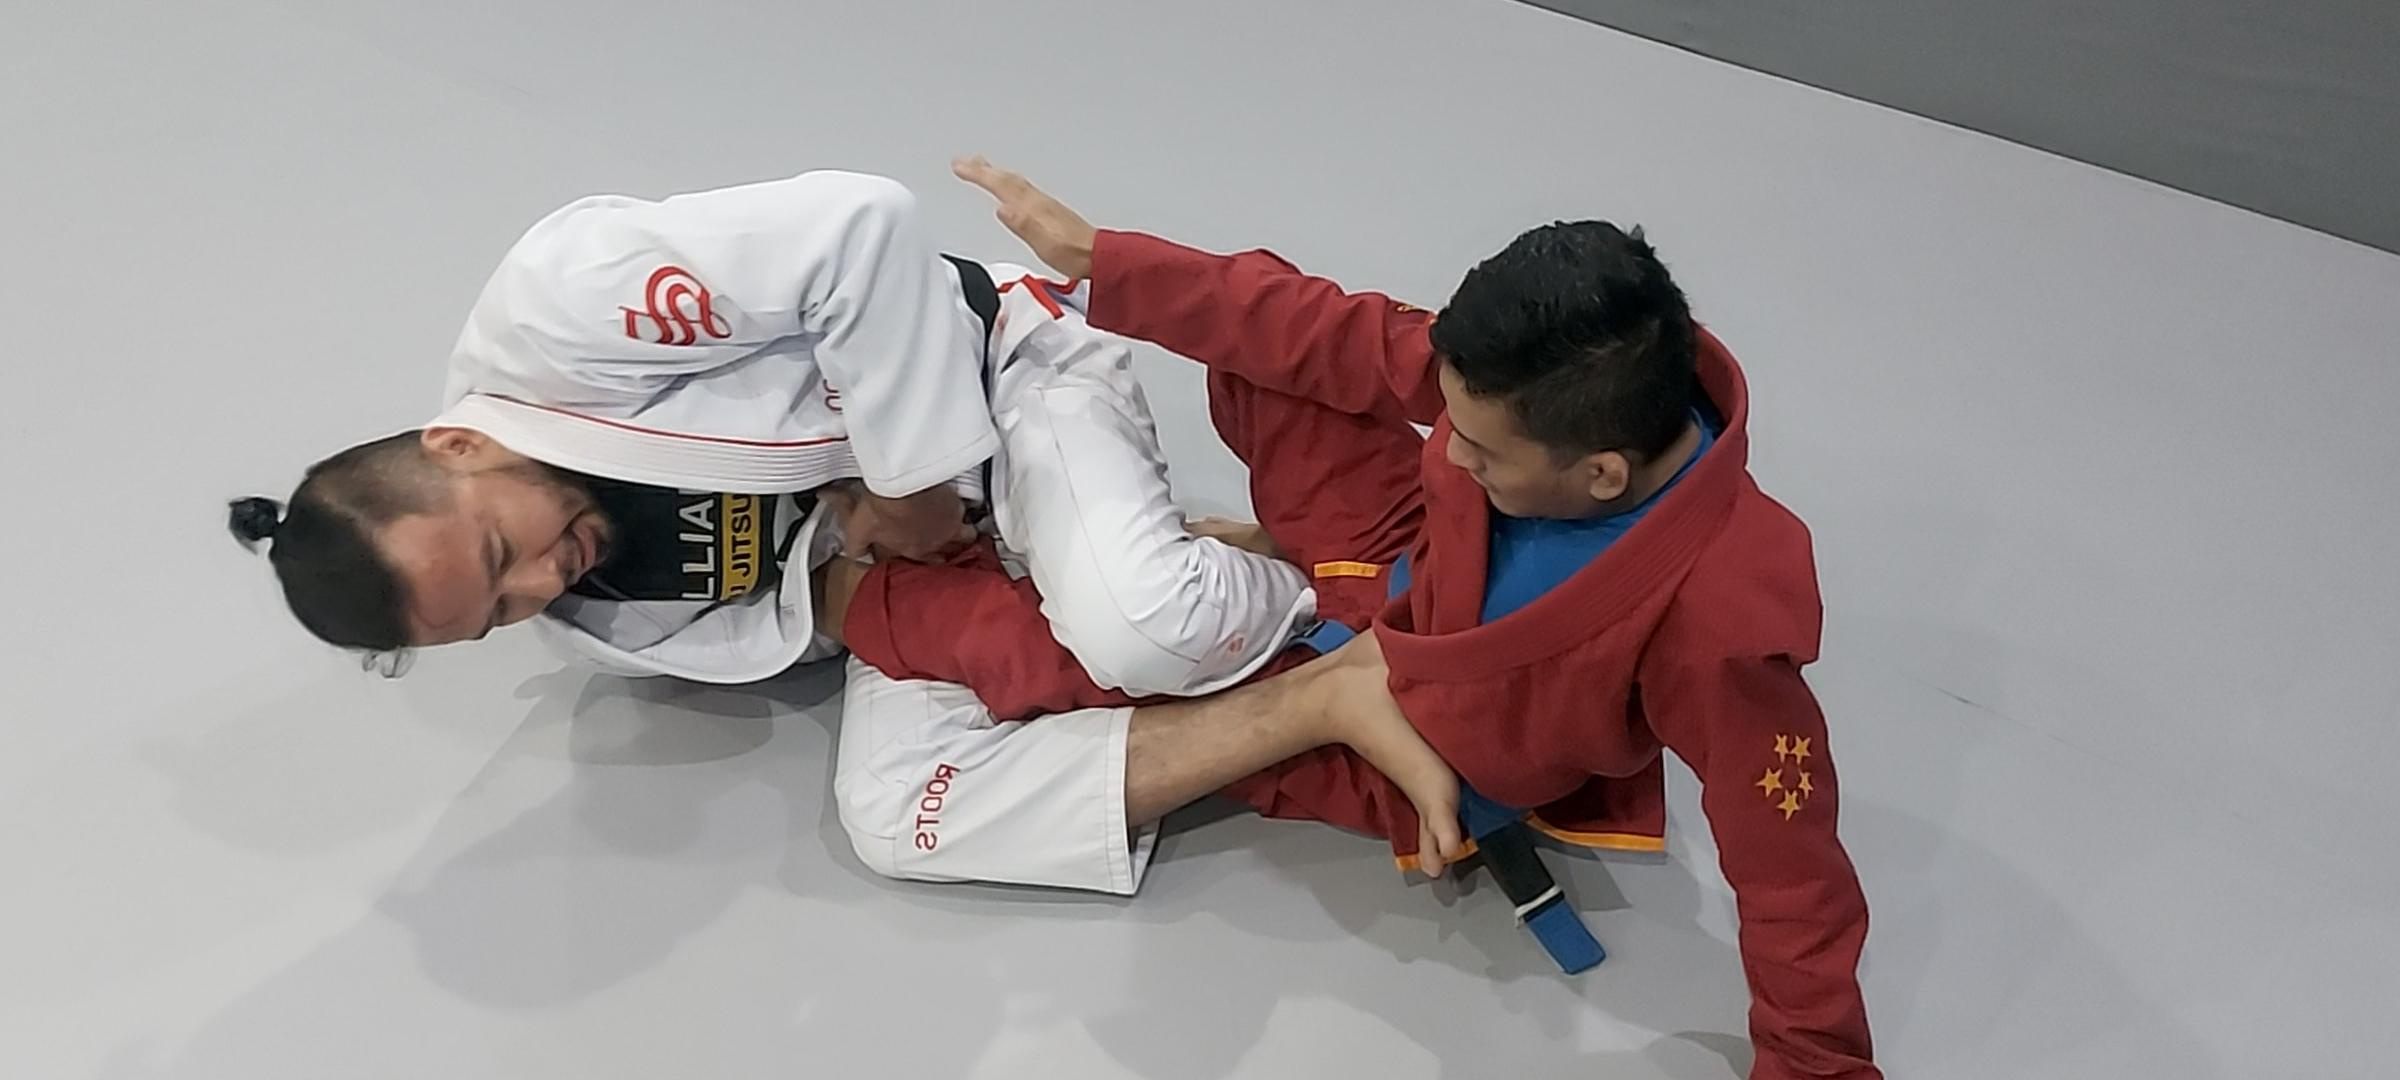 #RabuBakuHantam: Video tutorial teknik kuncian kaki straight footlock